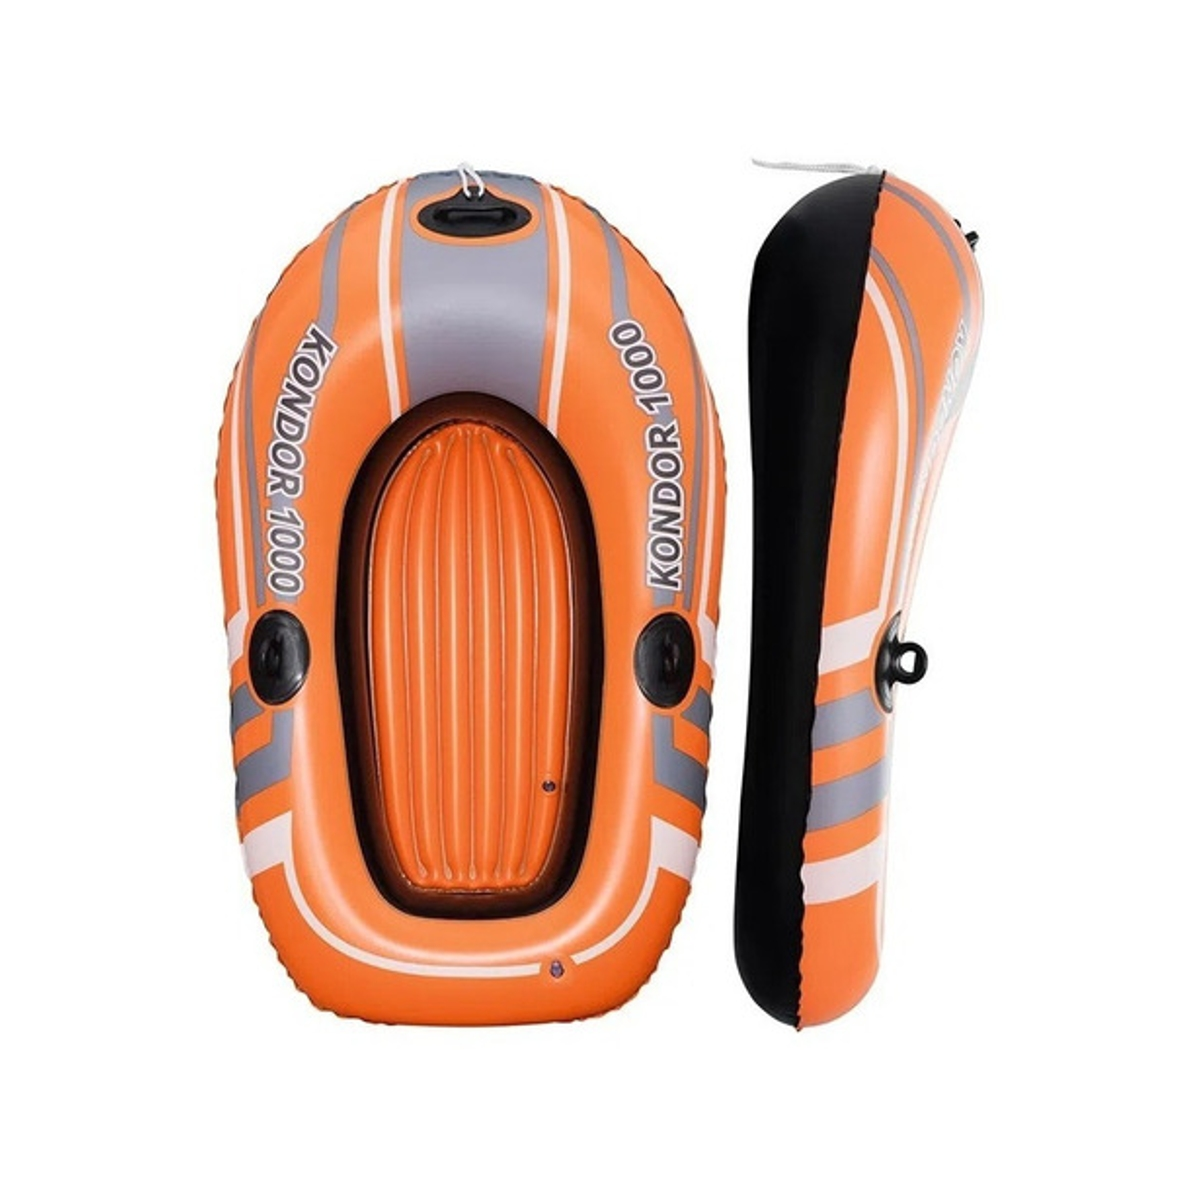 Bote inflável Para Crianças Bestway Hydro Force Kondor 1000